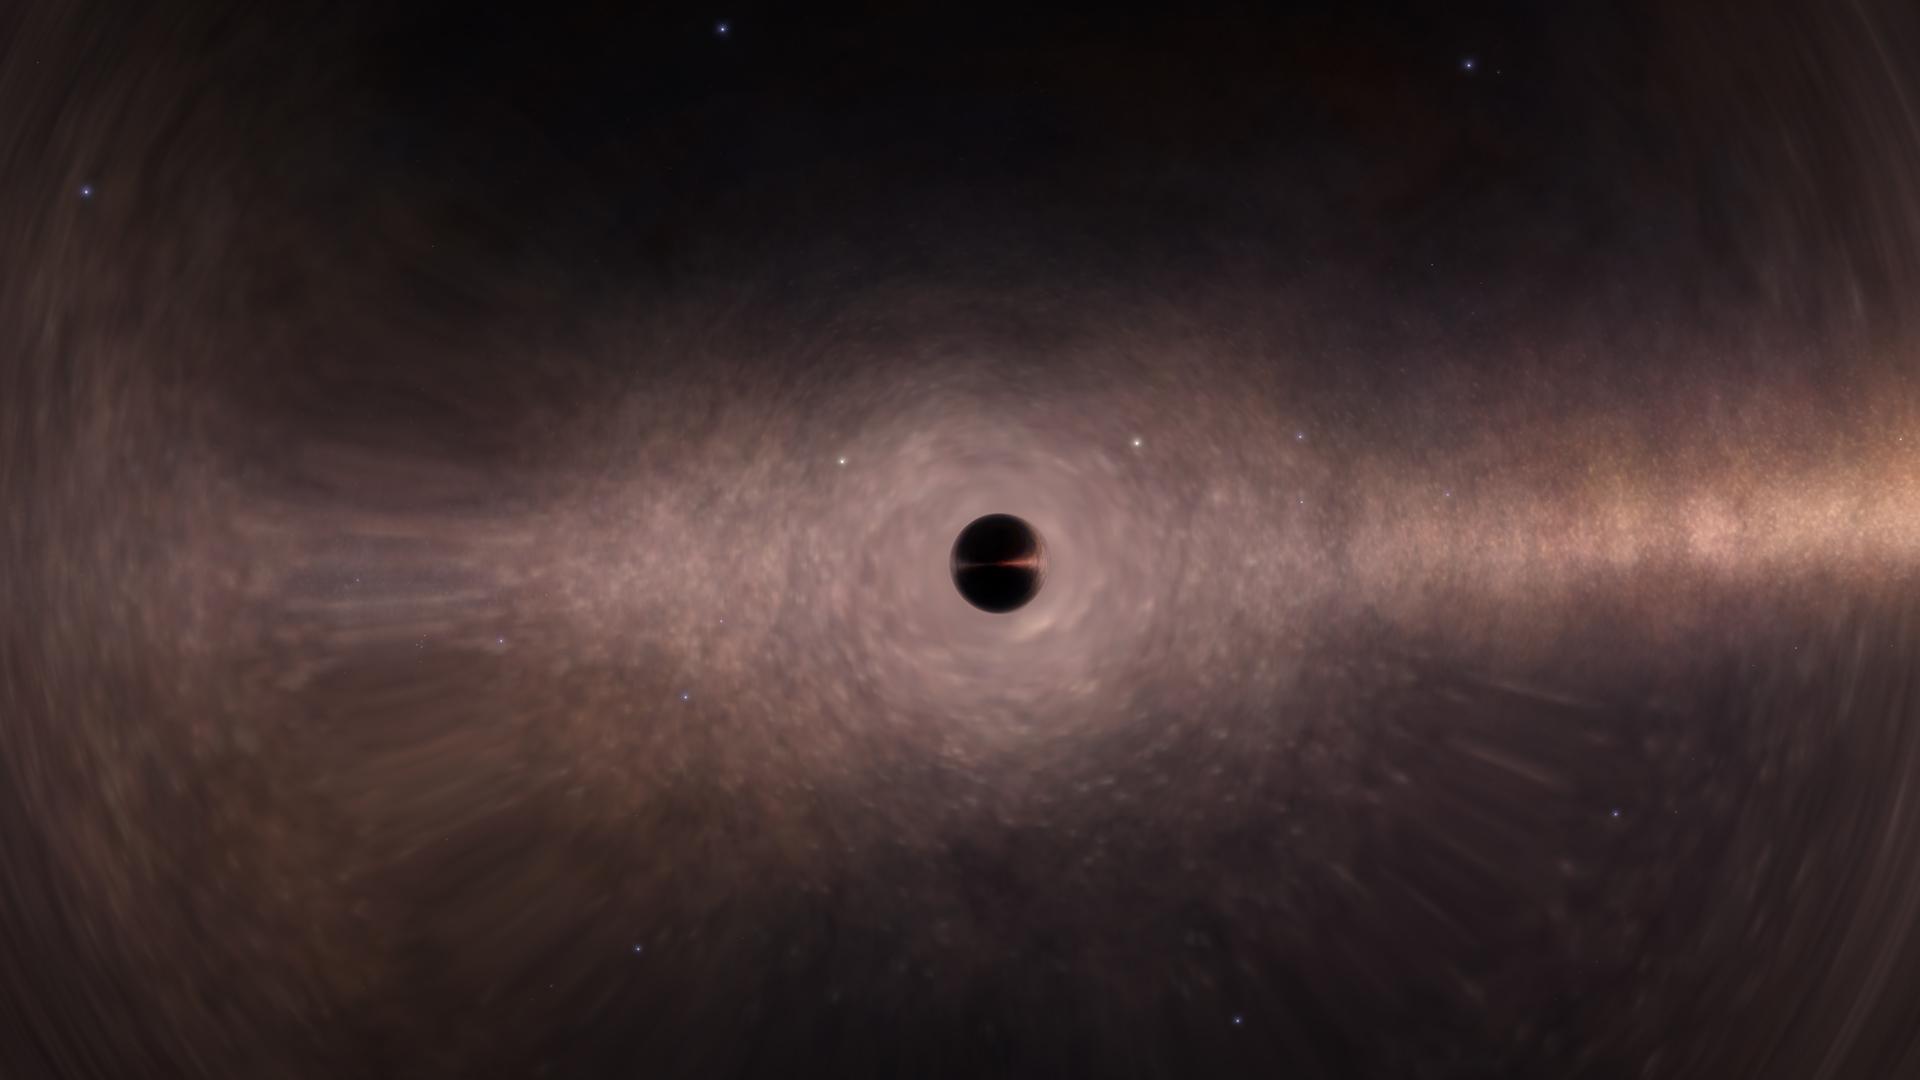 Dangerous Is a Black Hole (page 3) - Pics about space